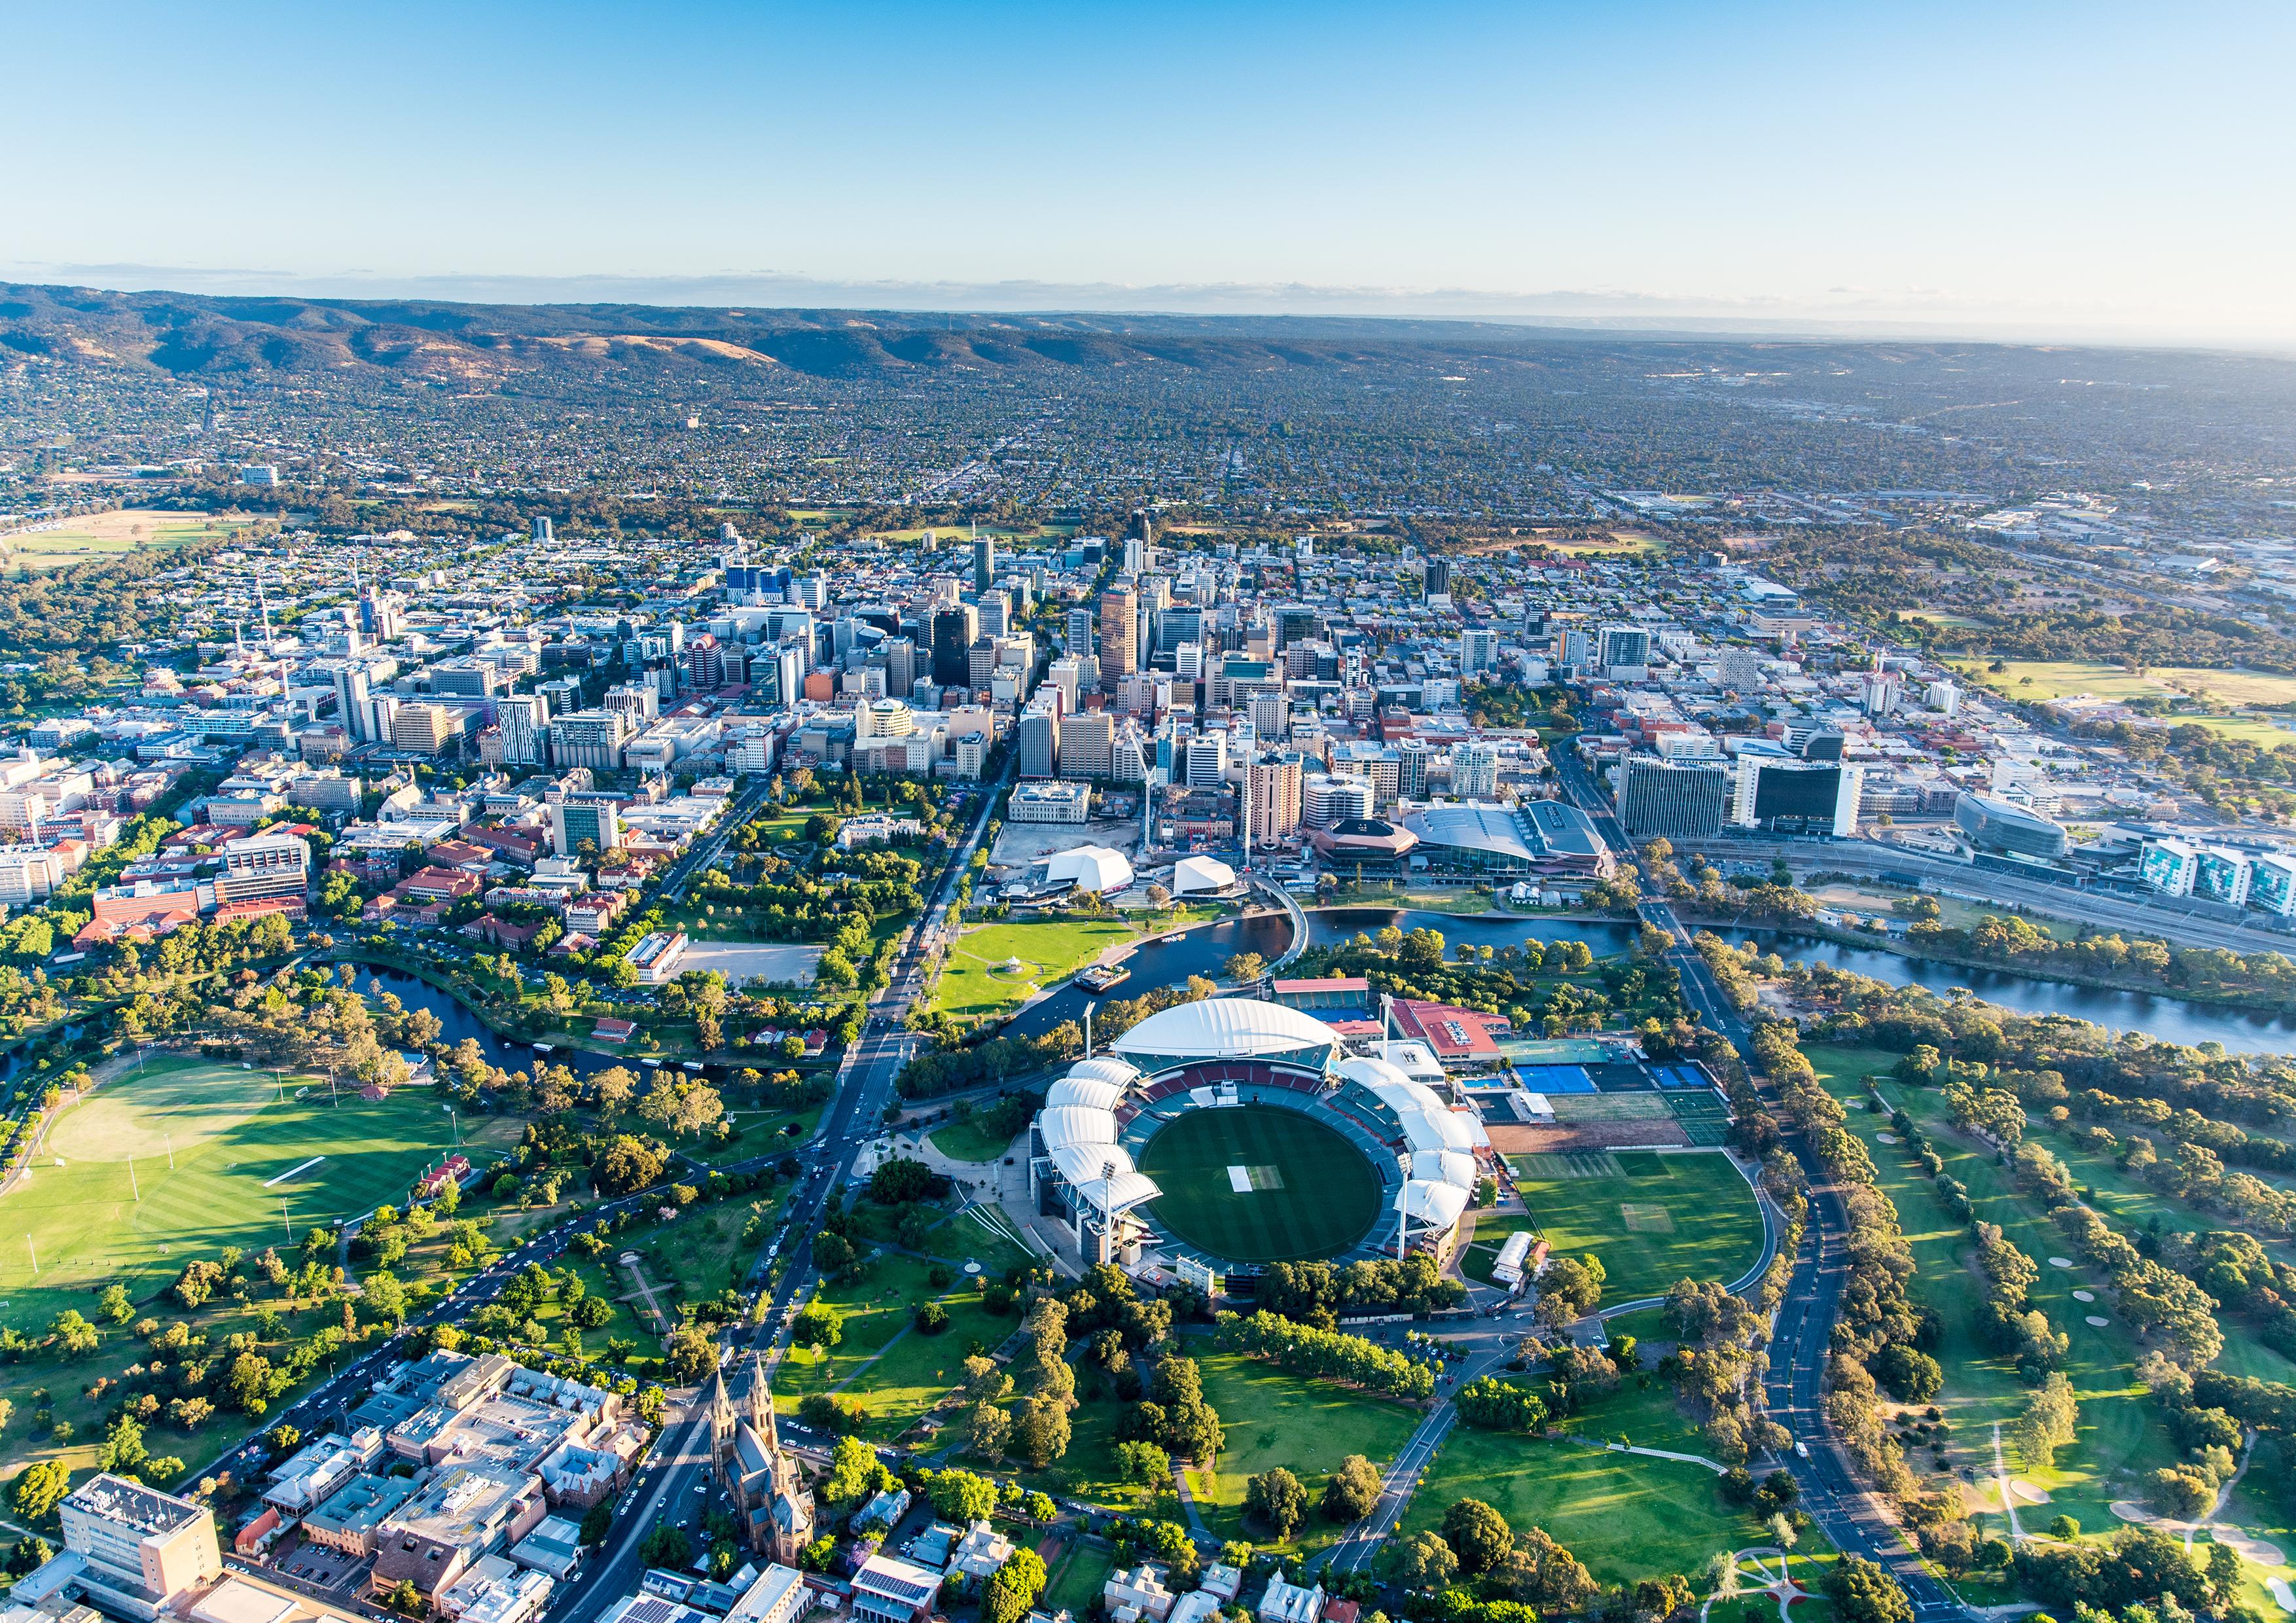 Let's make Adelaide a National Park City - Green Adelaide